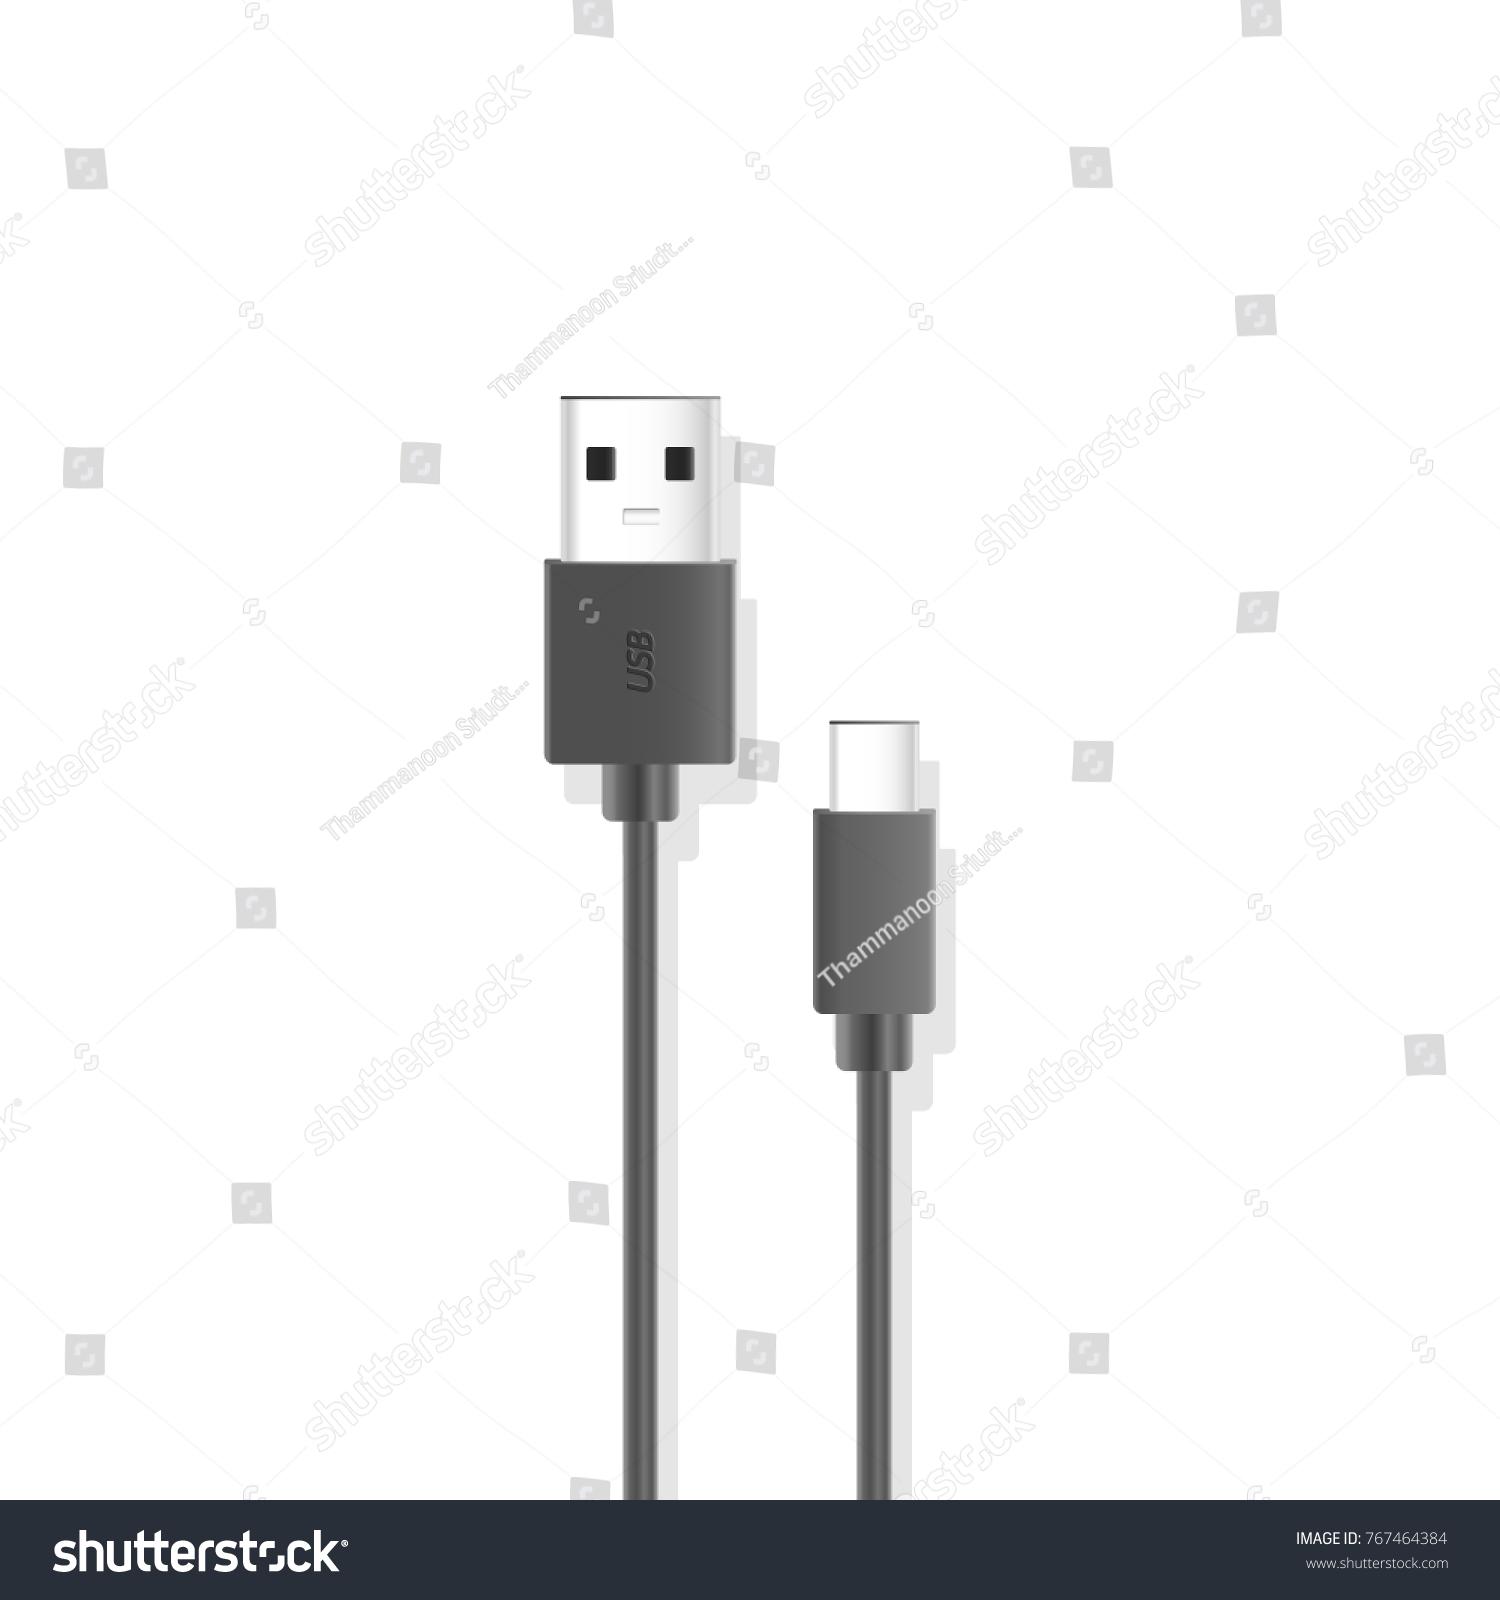 Scsi Centronics 50 Pin Plug Socket Ez Canvas To Usb Wiring Diagram